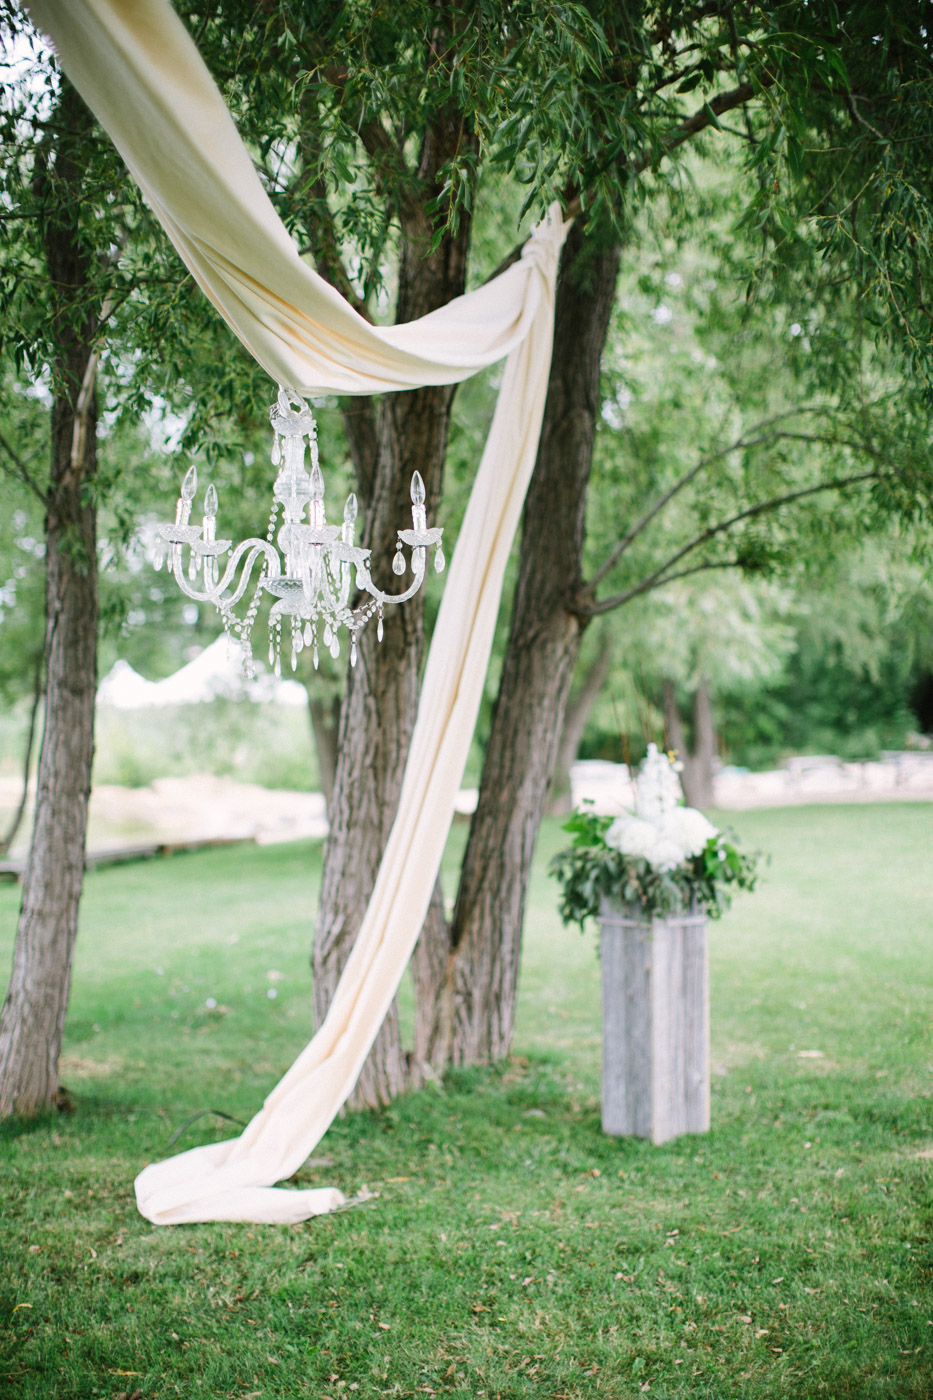 Backyard_collingwood_waterfront_diy_wedding-59.jpg